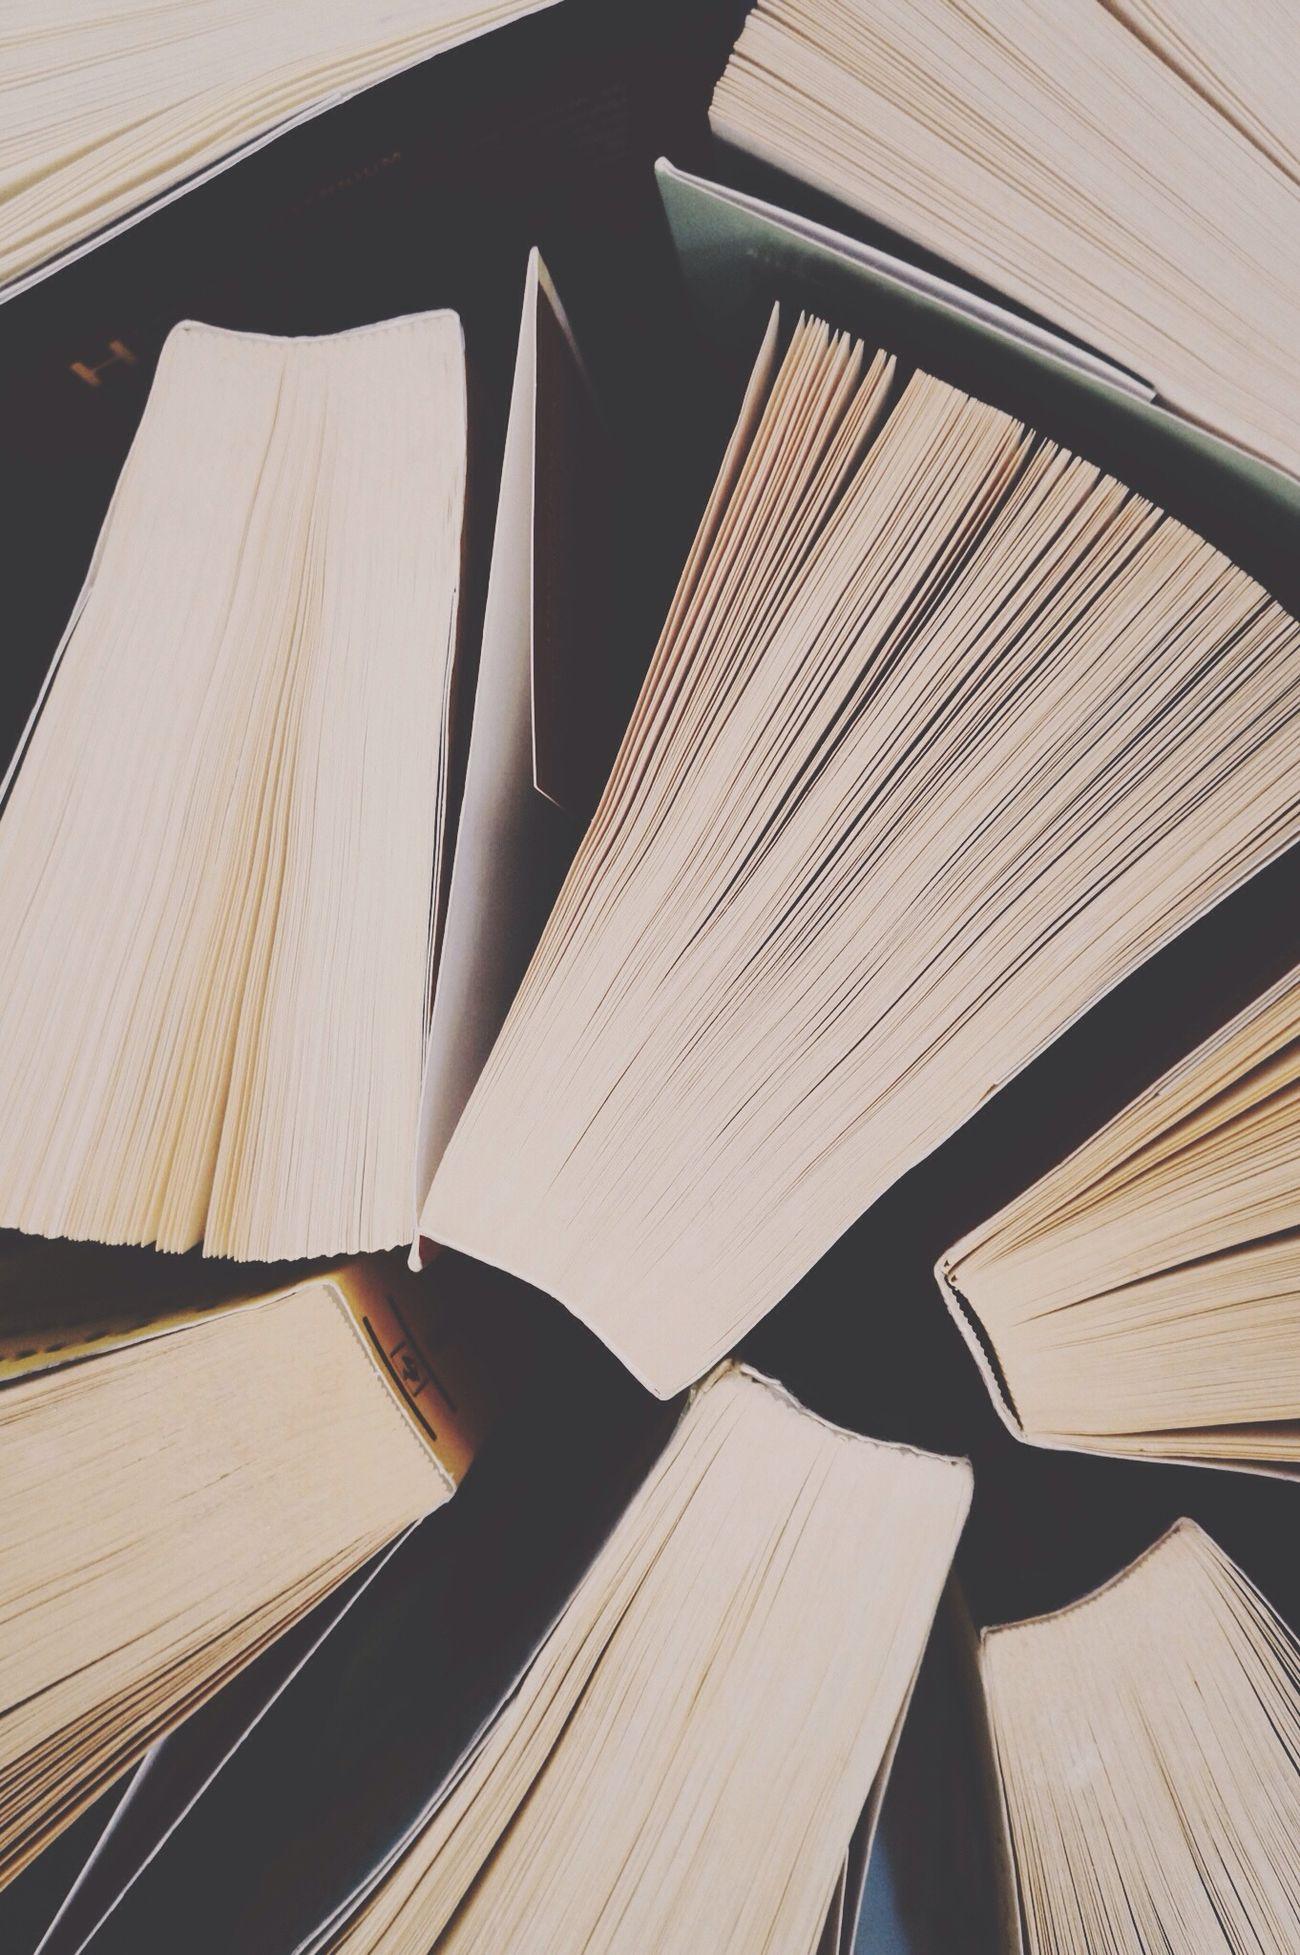 Paper Education Books Book Lovebooks Bookslover Bookstagram Bookworm Bookporn Bookphoto Books ♥ Bookaholic Read Reading Reading A Book